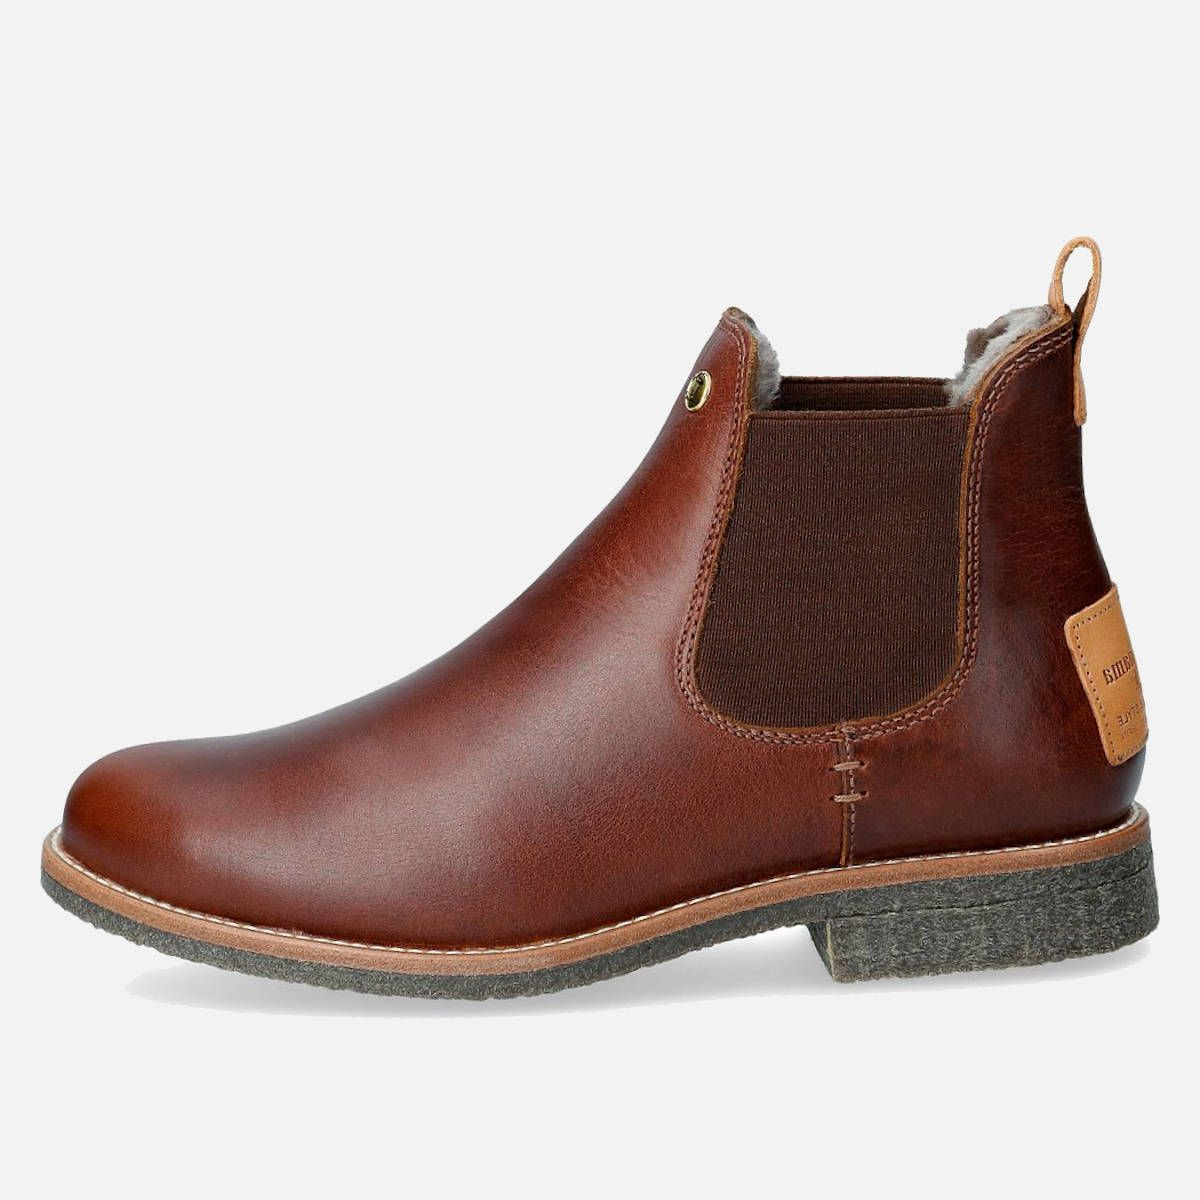 Panama Jack Giordana Warm Lined Ladies Chelsea Boots 0e128a6741b